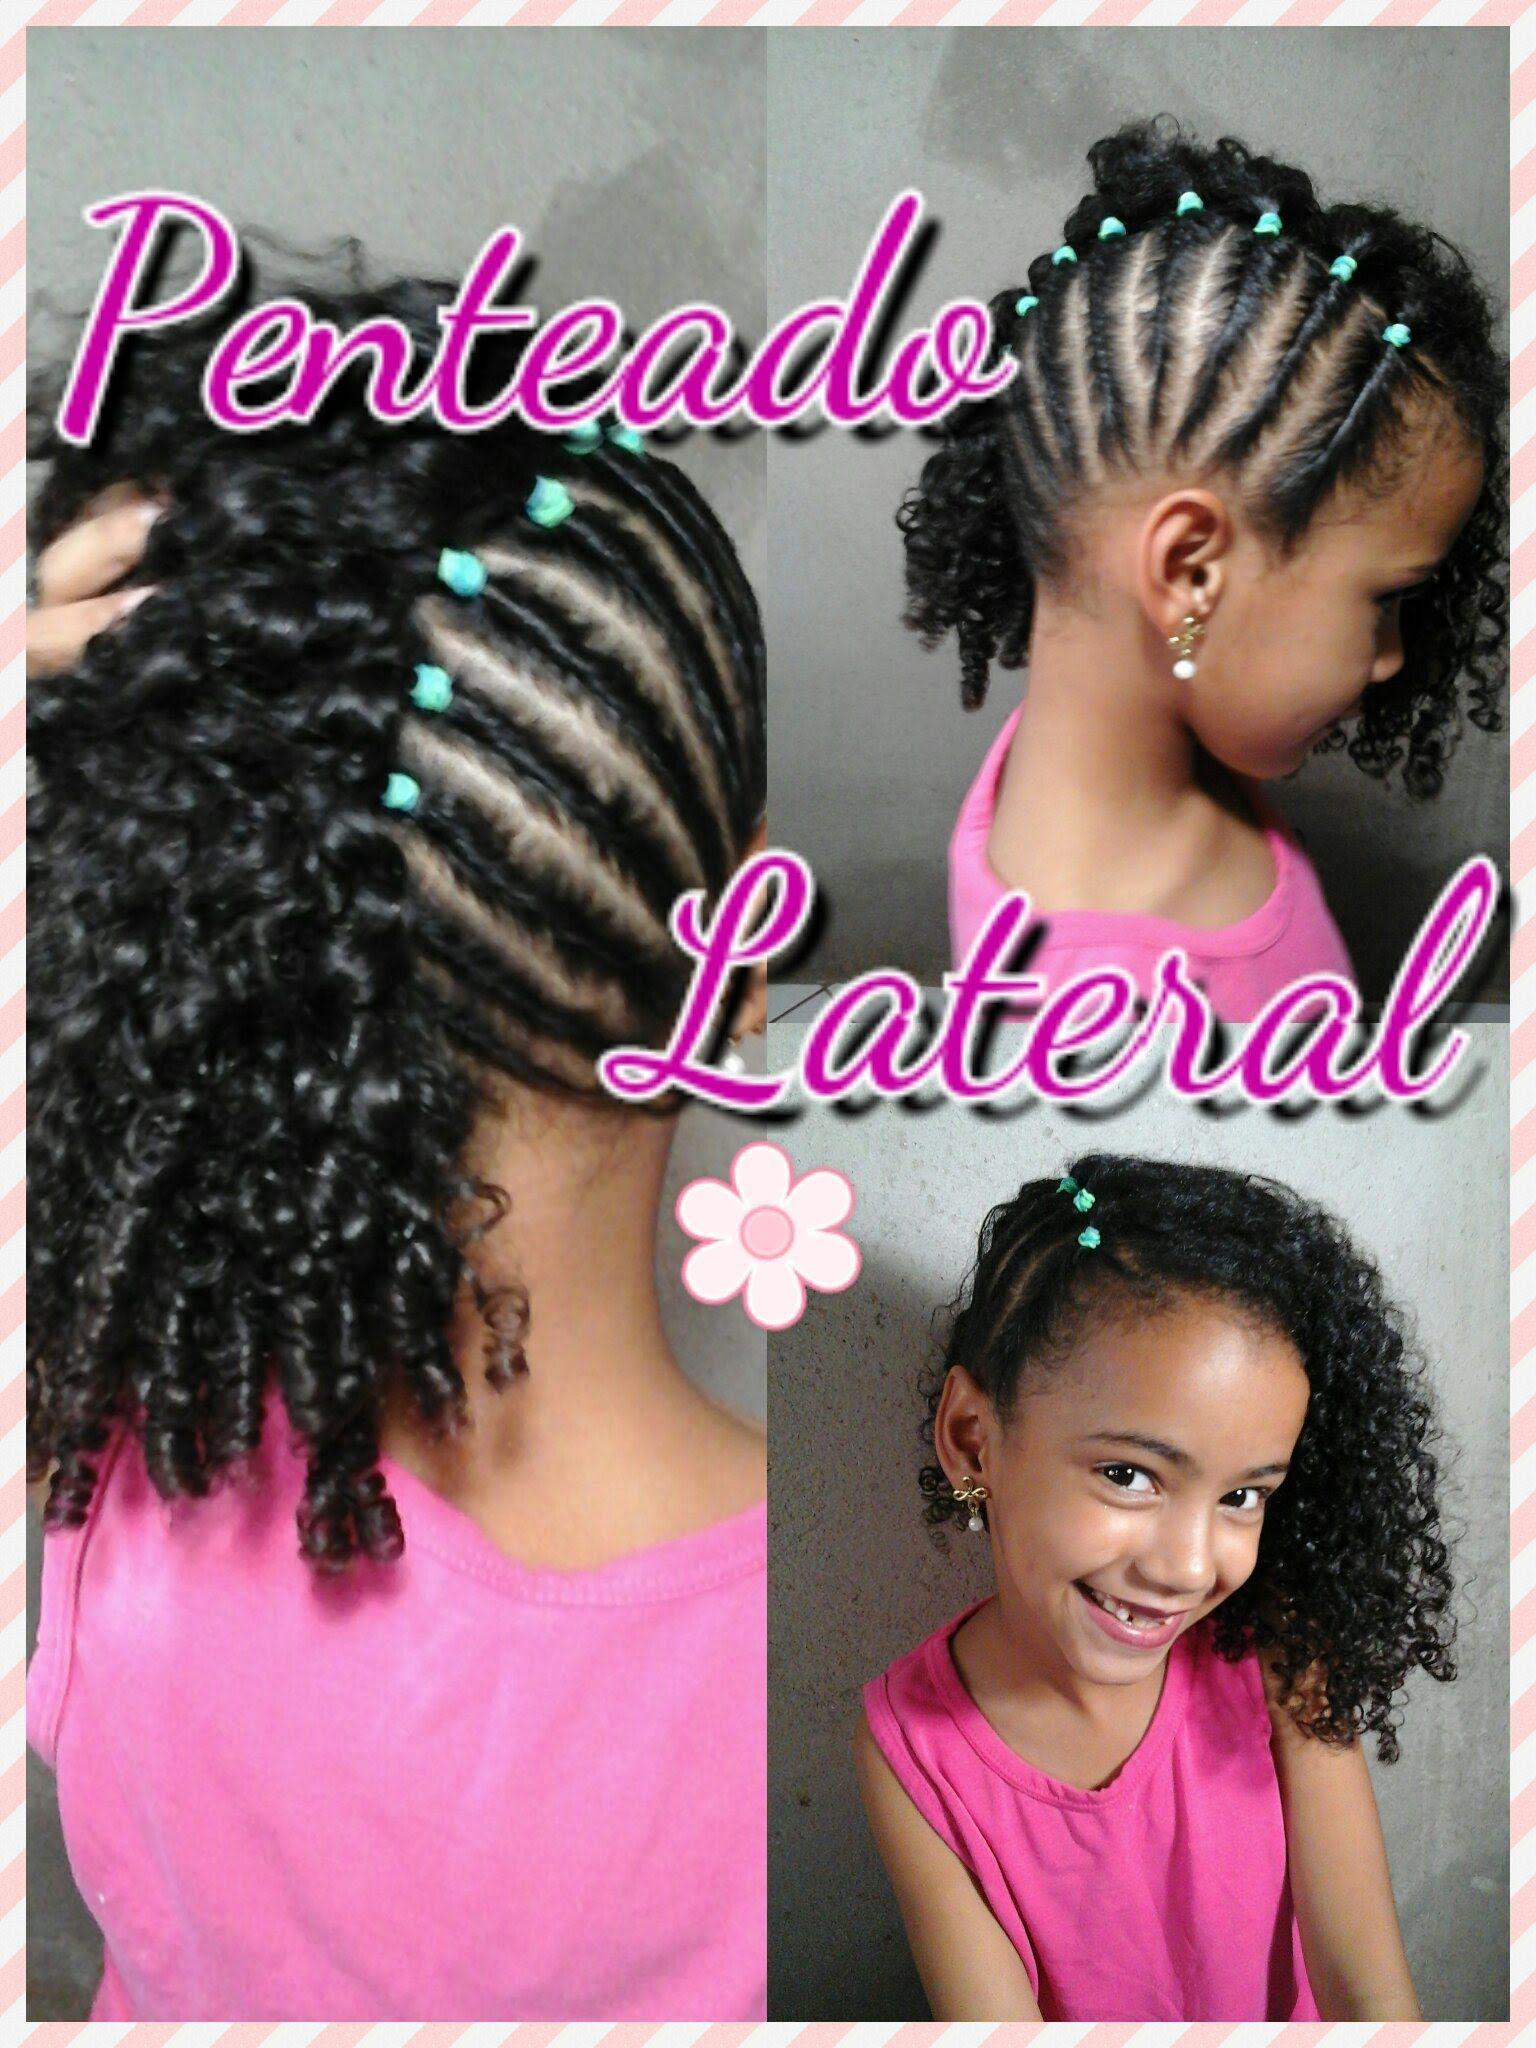 Penteado Lateral Para Cabelos Cacheados Infantil Cabelos